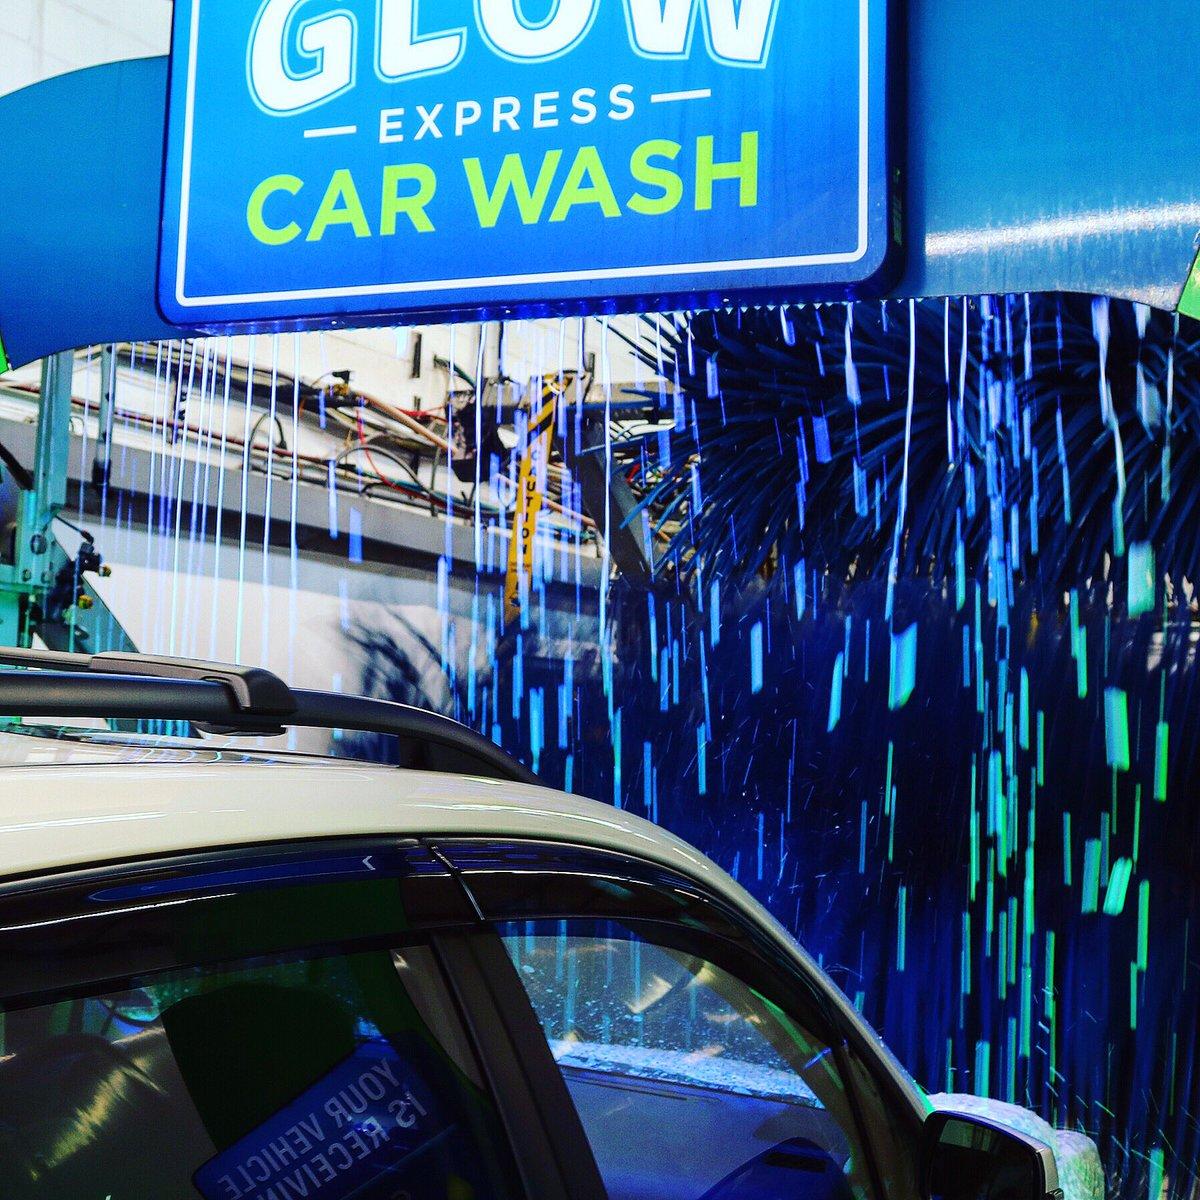 Glow Car Wash on Twitter: